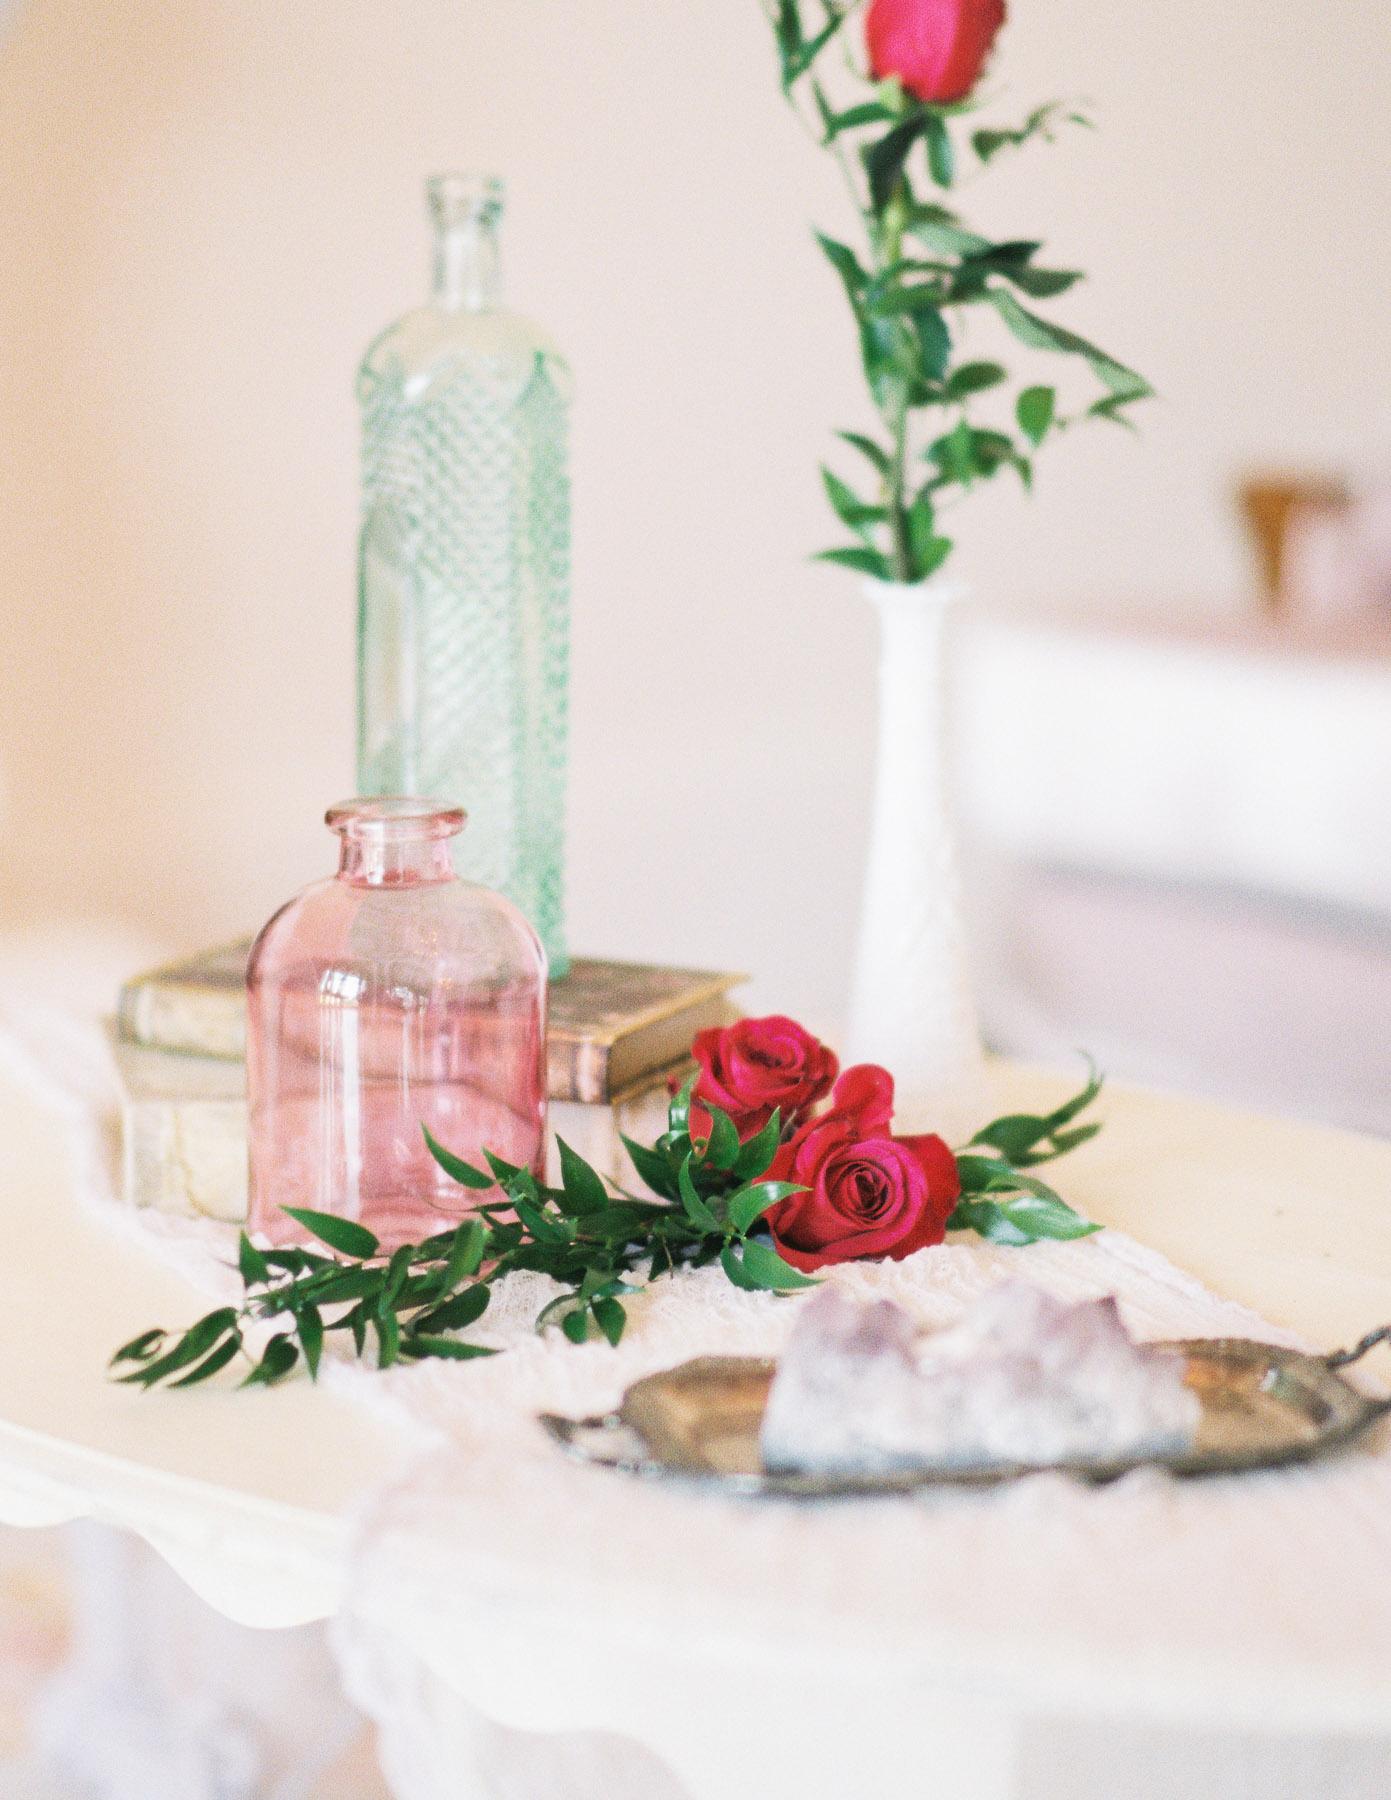 KateTaramykinStudios-Portfolio-Weddings-LuxmoreGrande-1.jpg